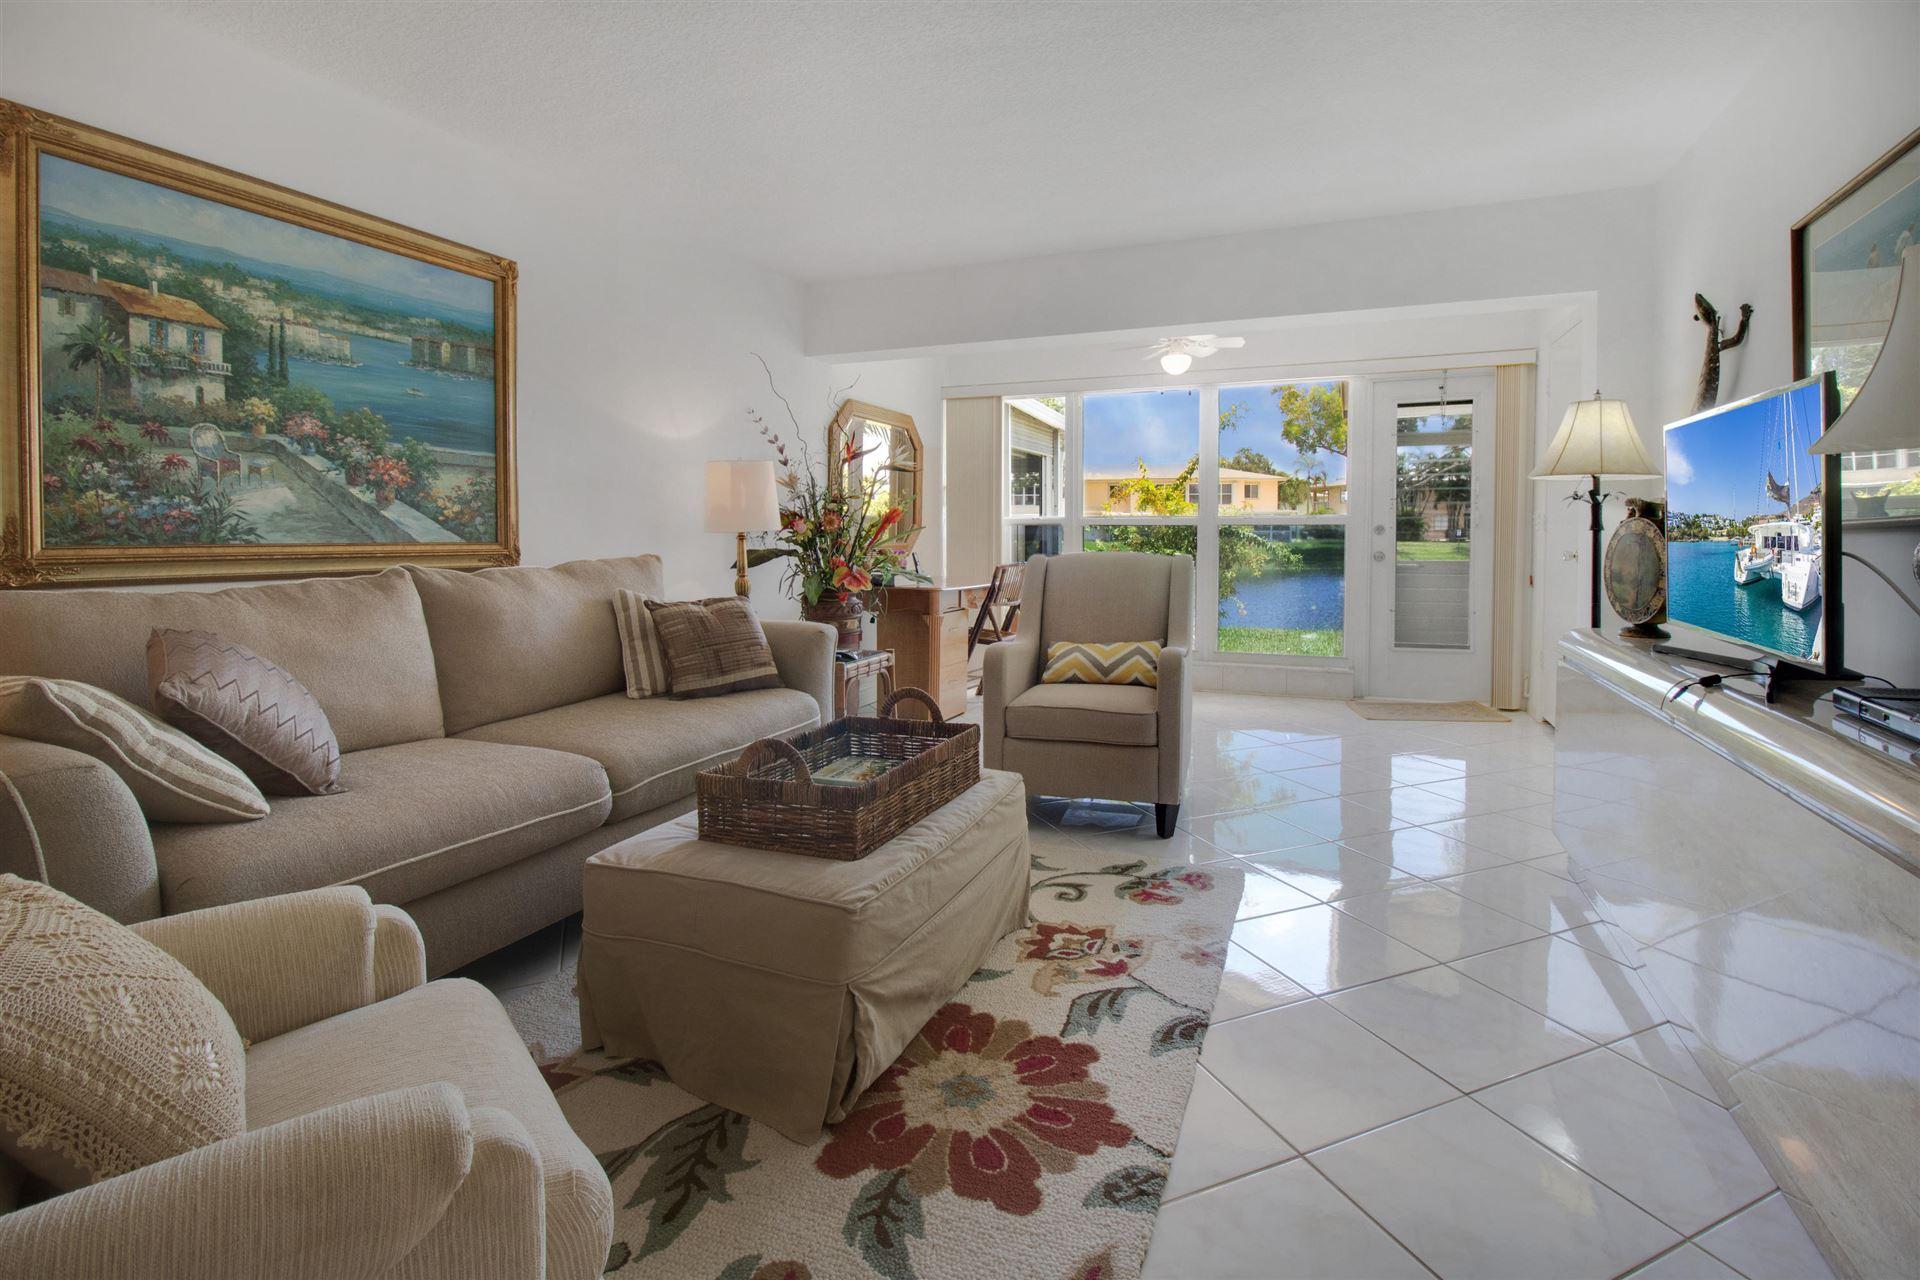 1441 NW 19th Terrace #104, Delray Beach, FL 33445 - #: RX-10672845